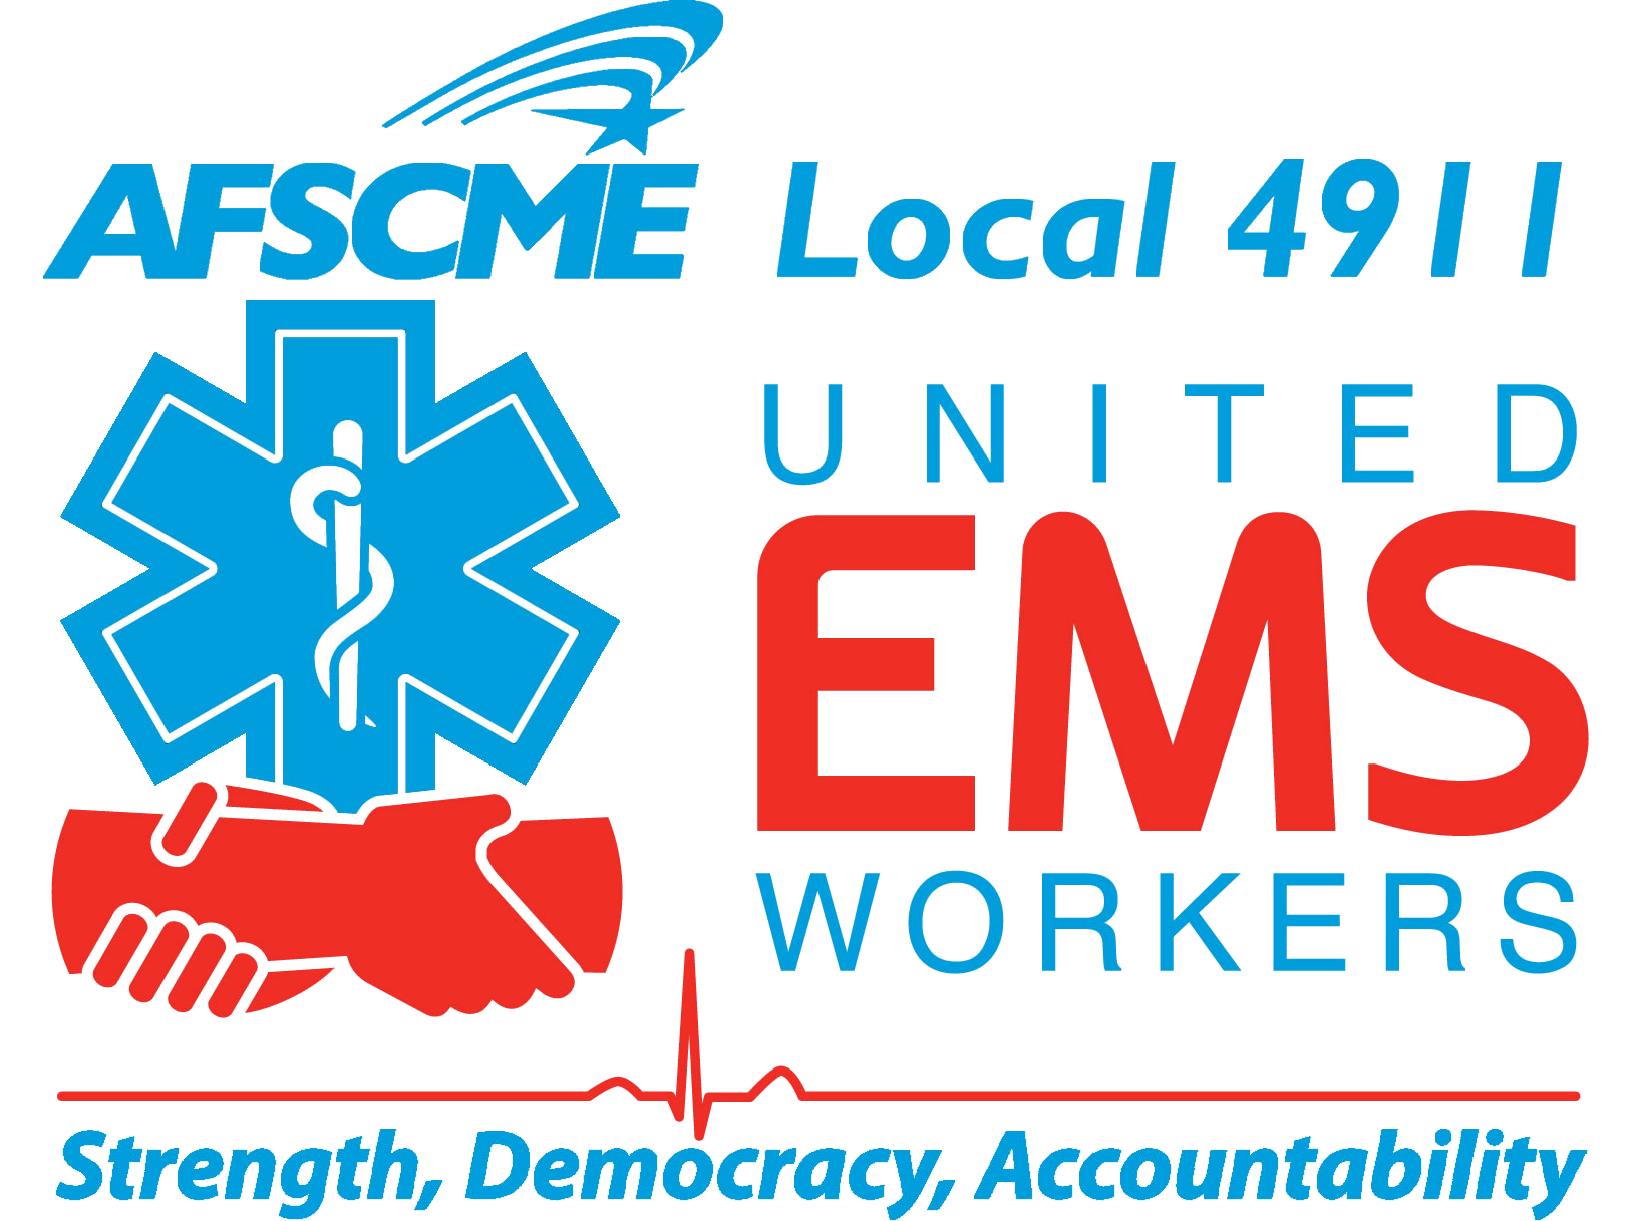 (c) Uemsw.org